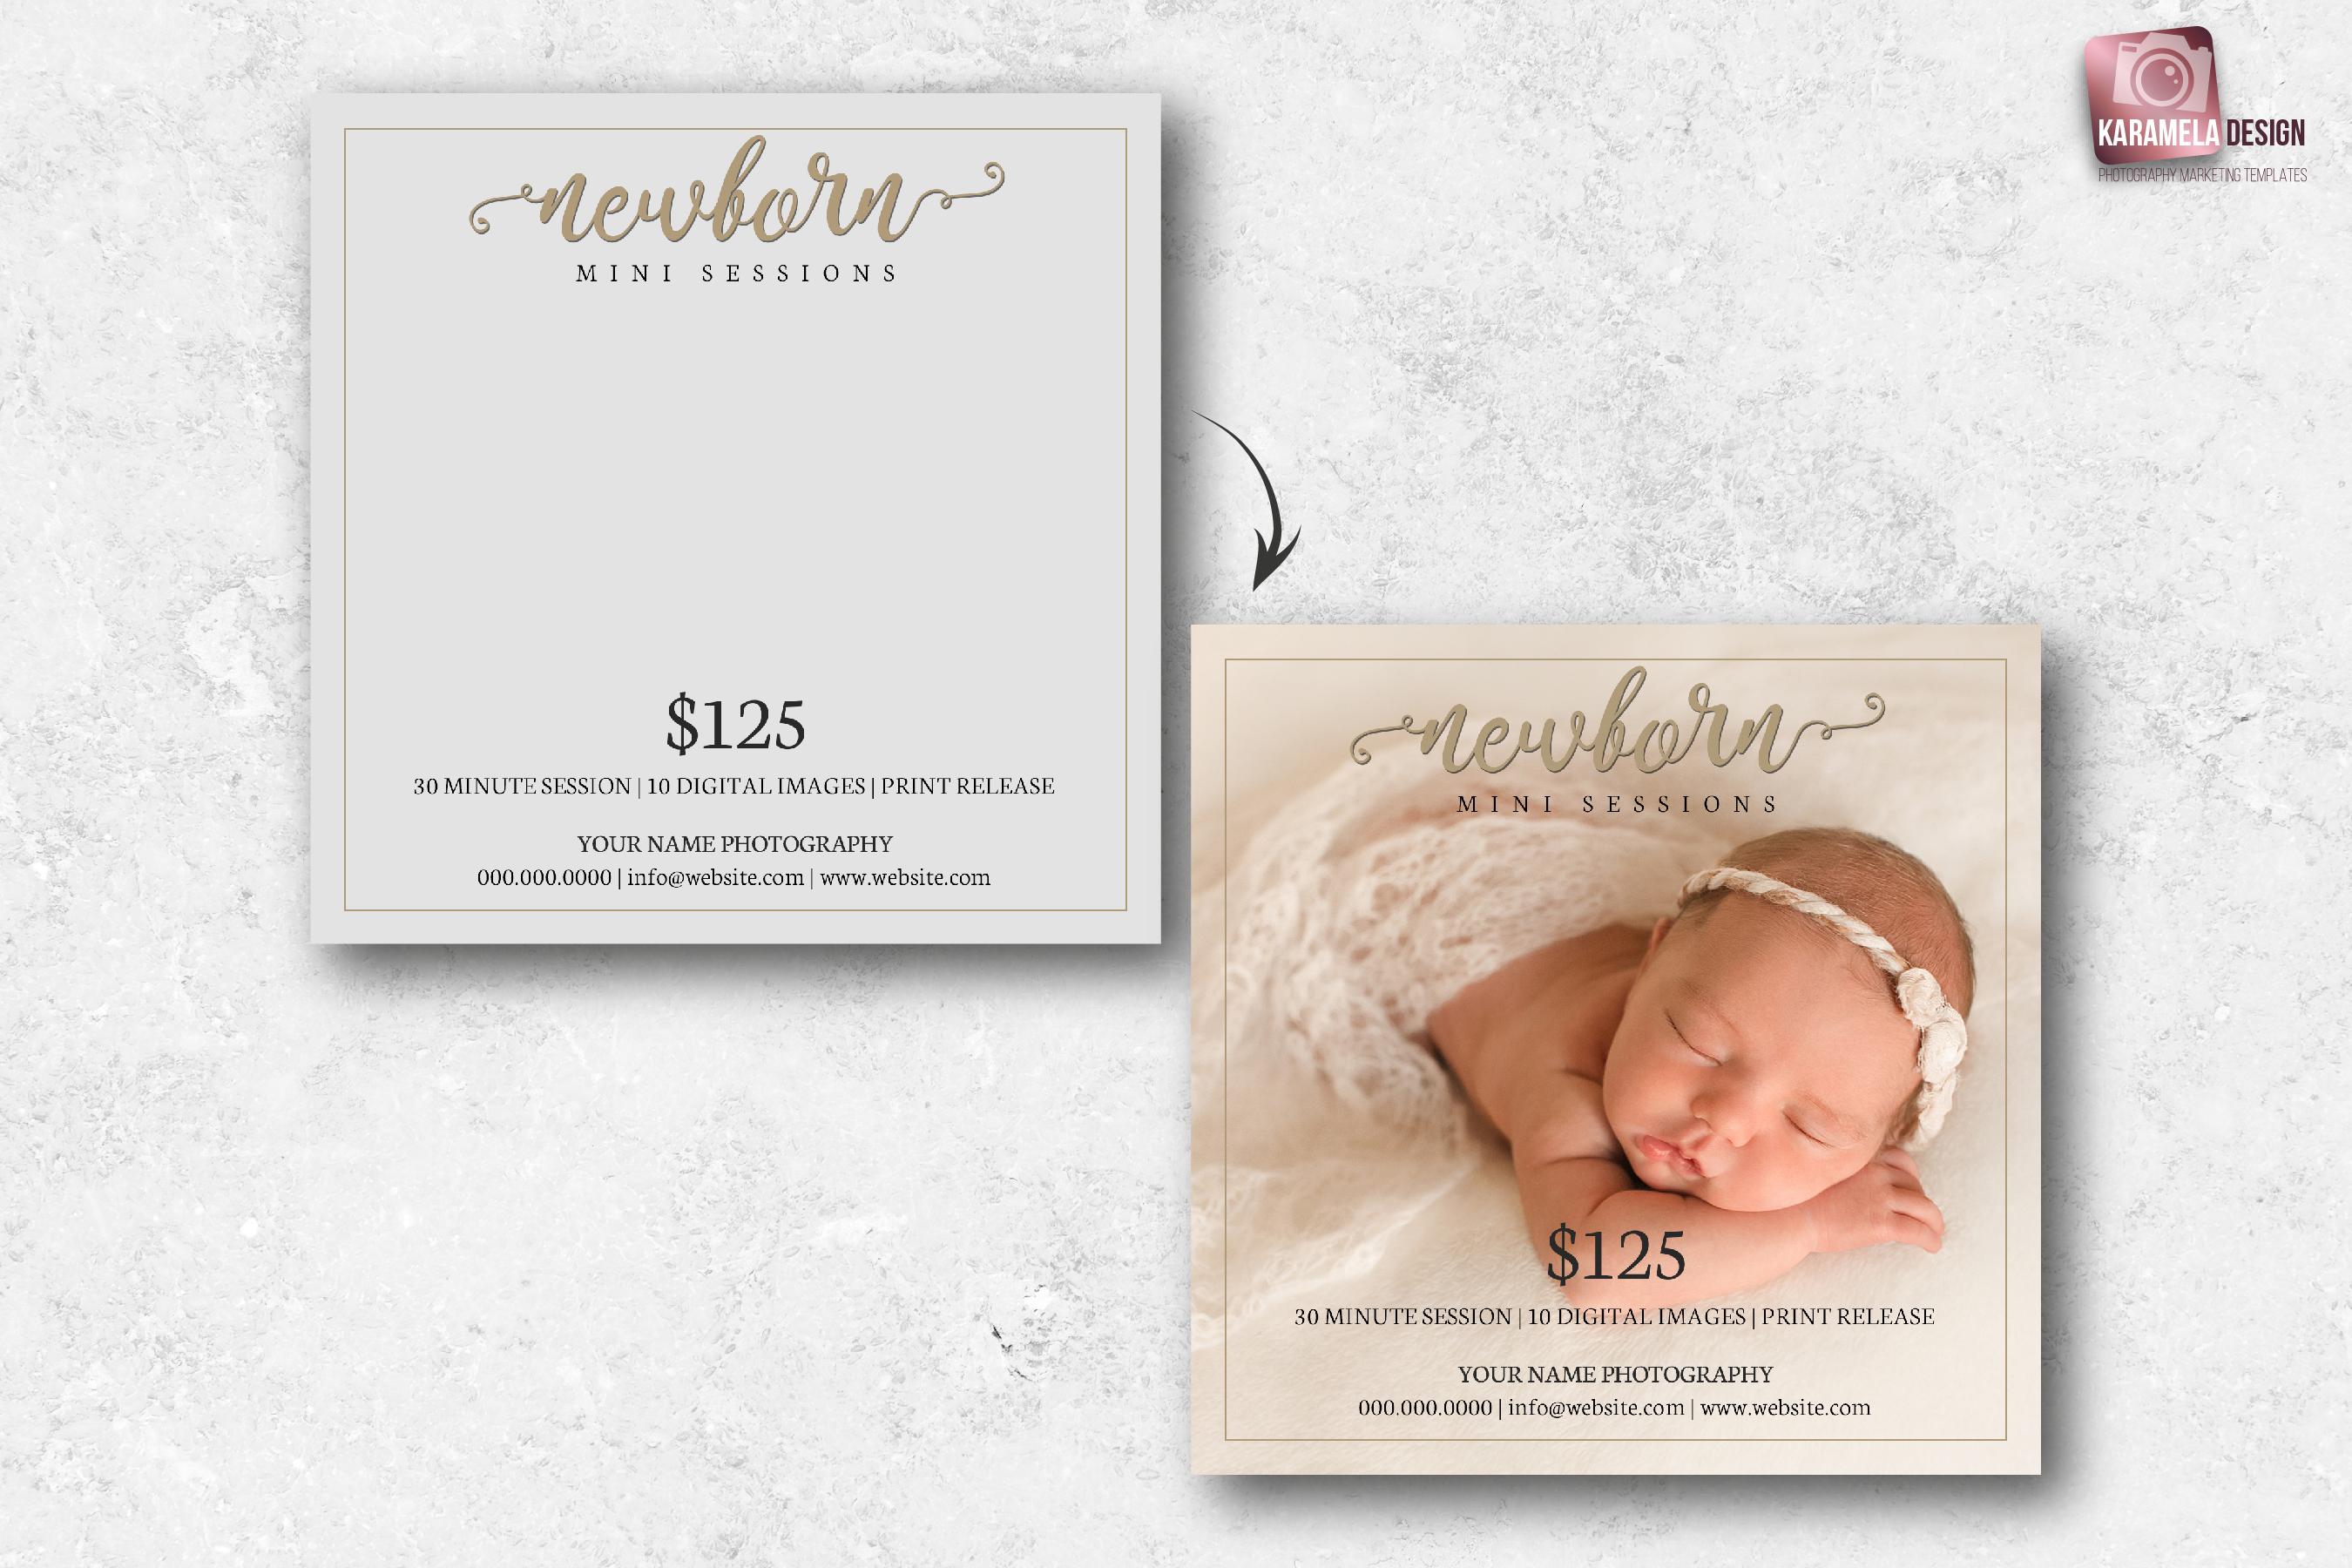 Newborn Mini Sessions Template example image 2